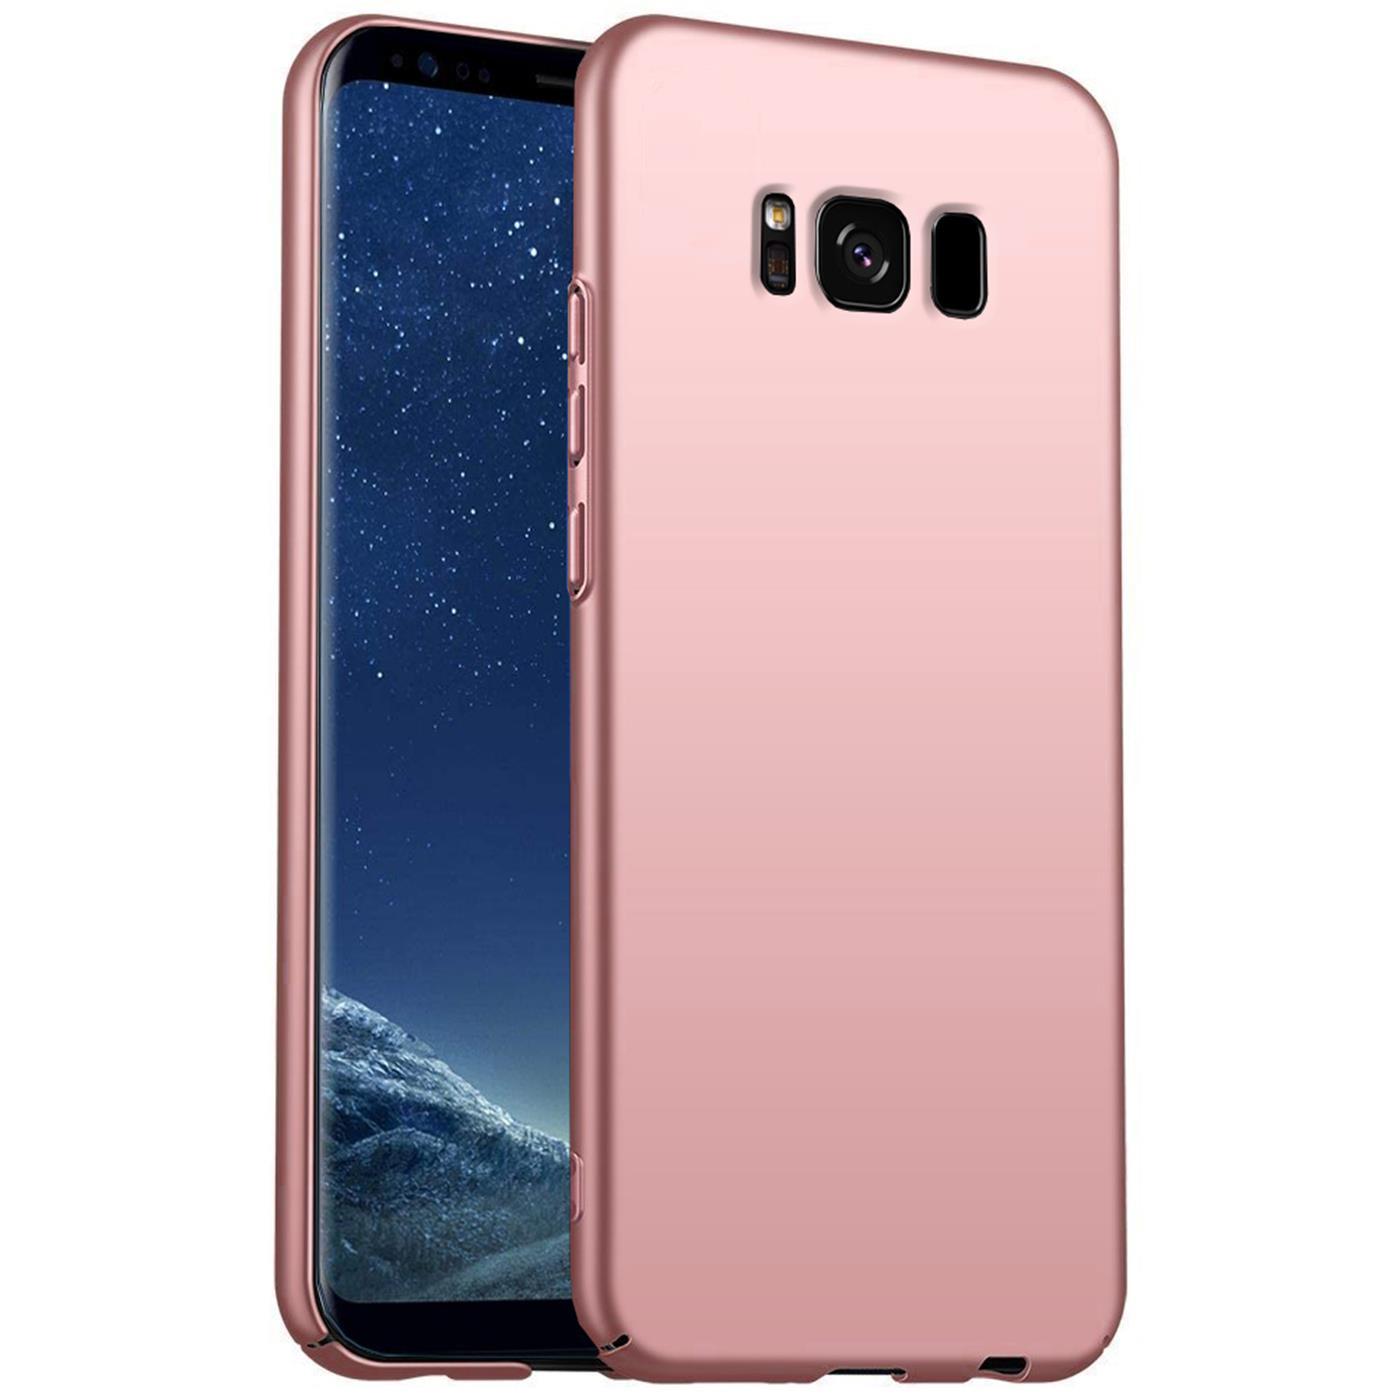 Hard-Back-Case-Cover-Samsung-Galaxy-j3-2016-duenn-Cover-Slim-Shockproof-Rugged Indexbild 18